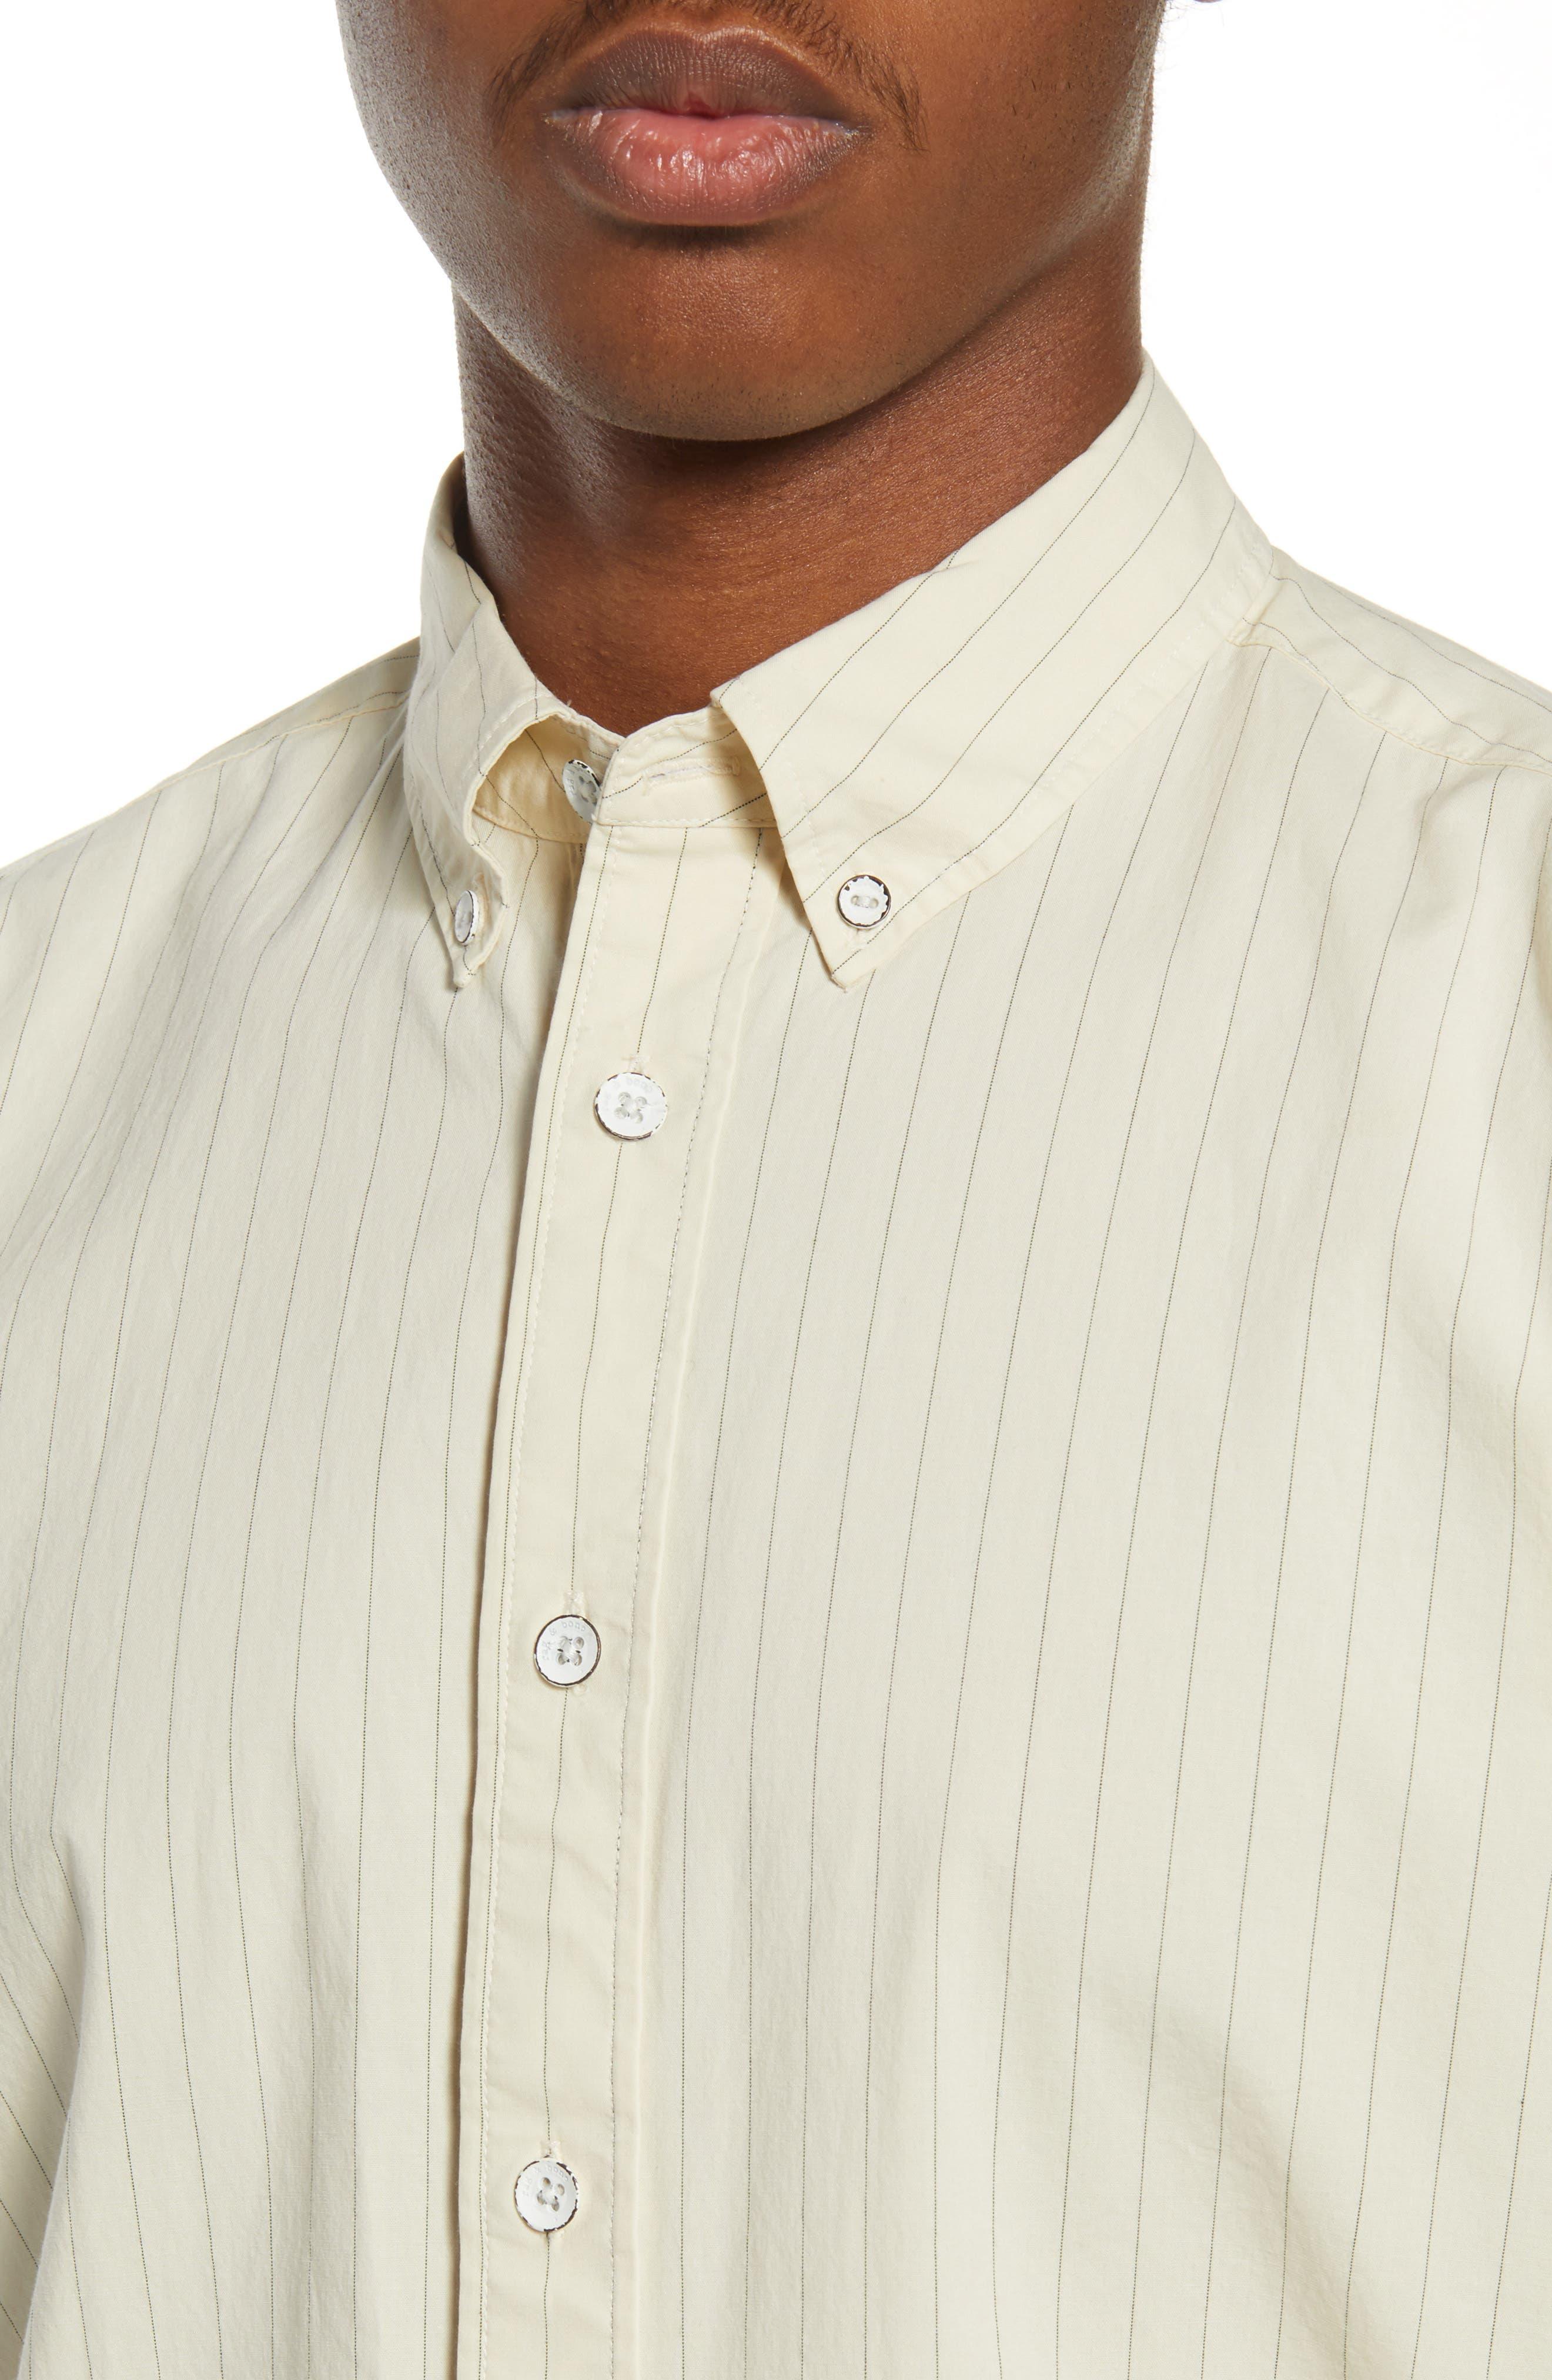 Rag & Bone Fit 2 Tomlin Slim Fit Stripe Button-Down Shirt